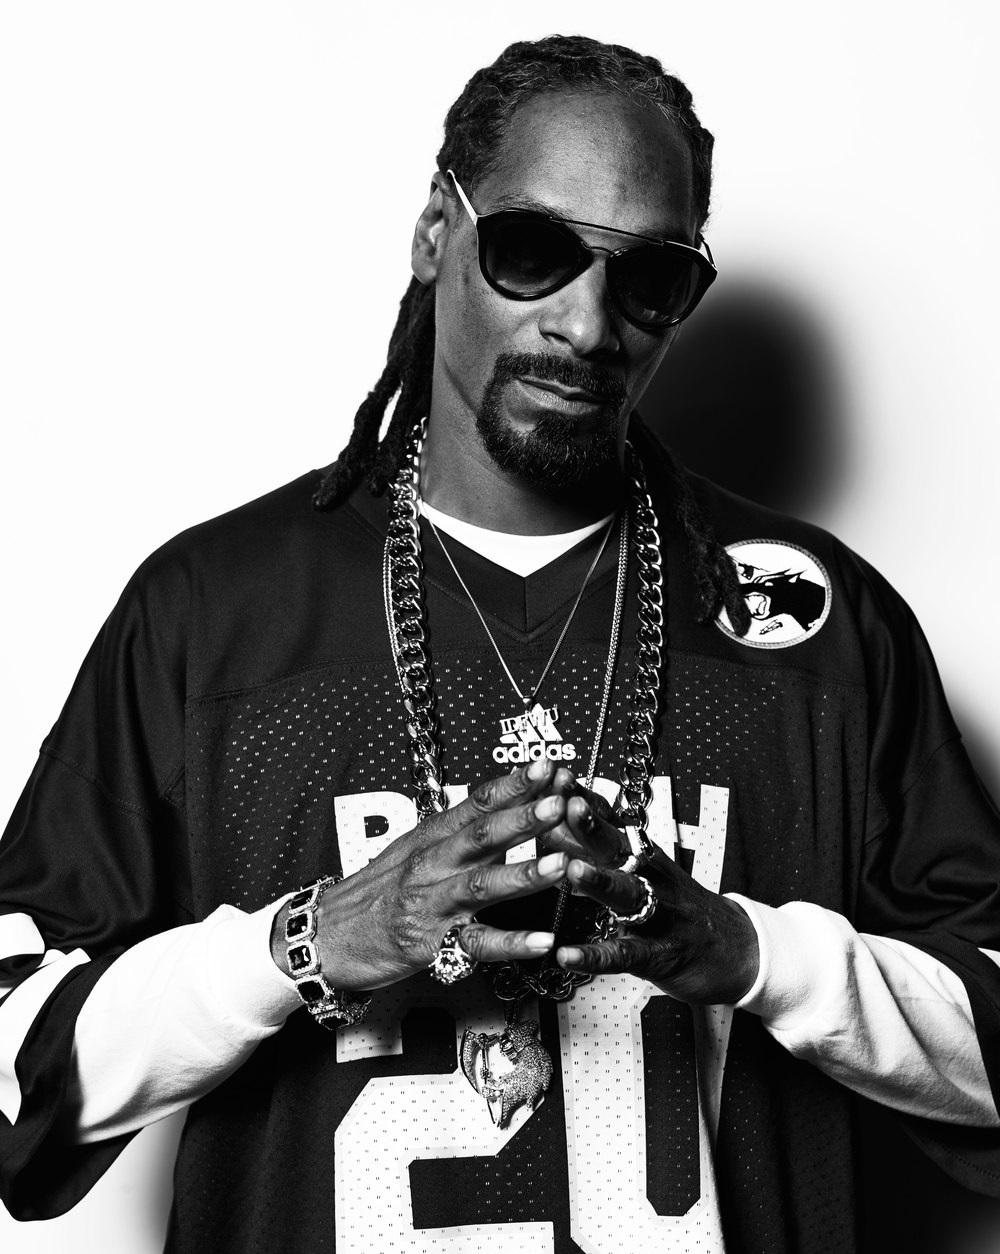 Snoop Dogg profile family, Affairs, Biodata, wiki, Diet, Age